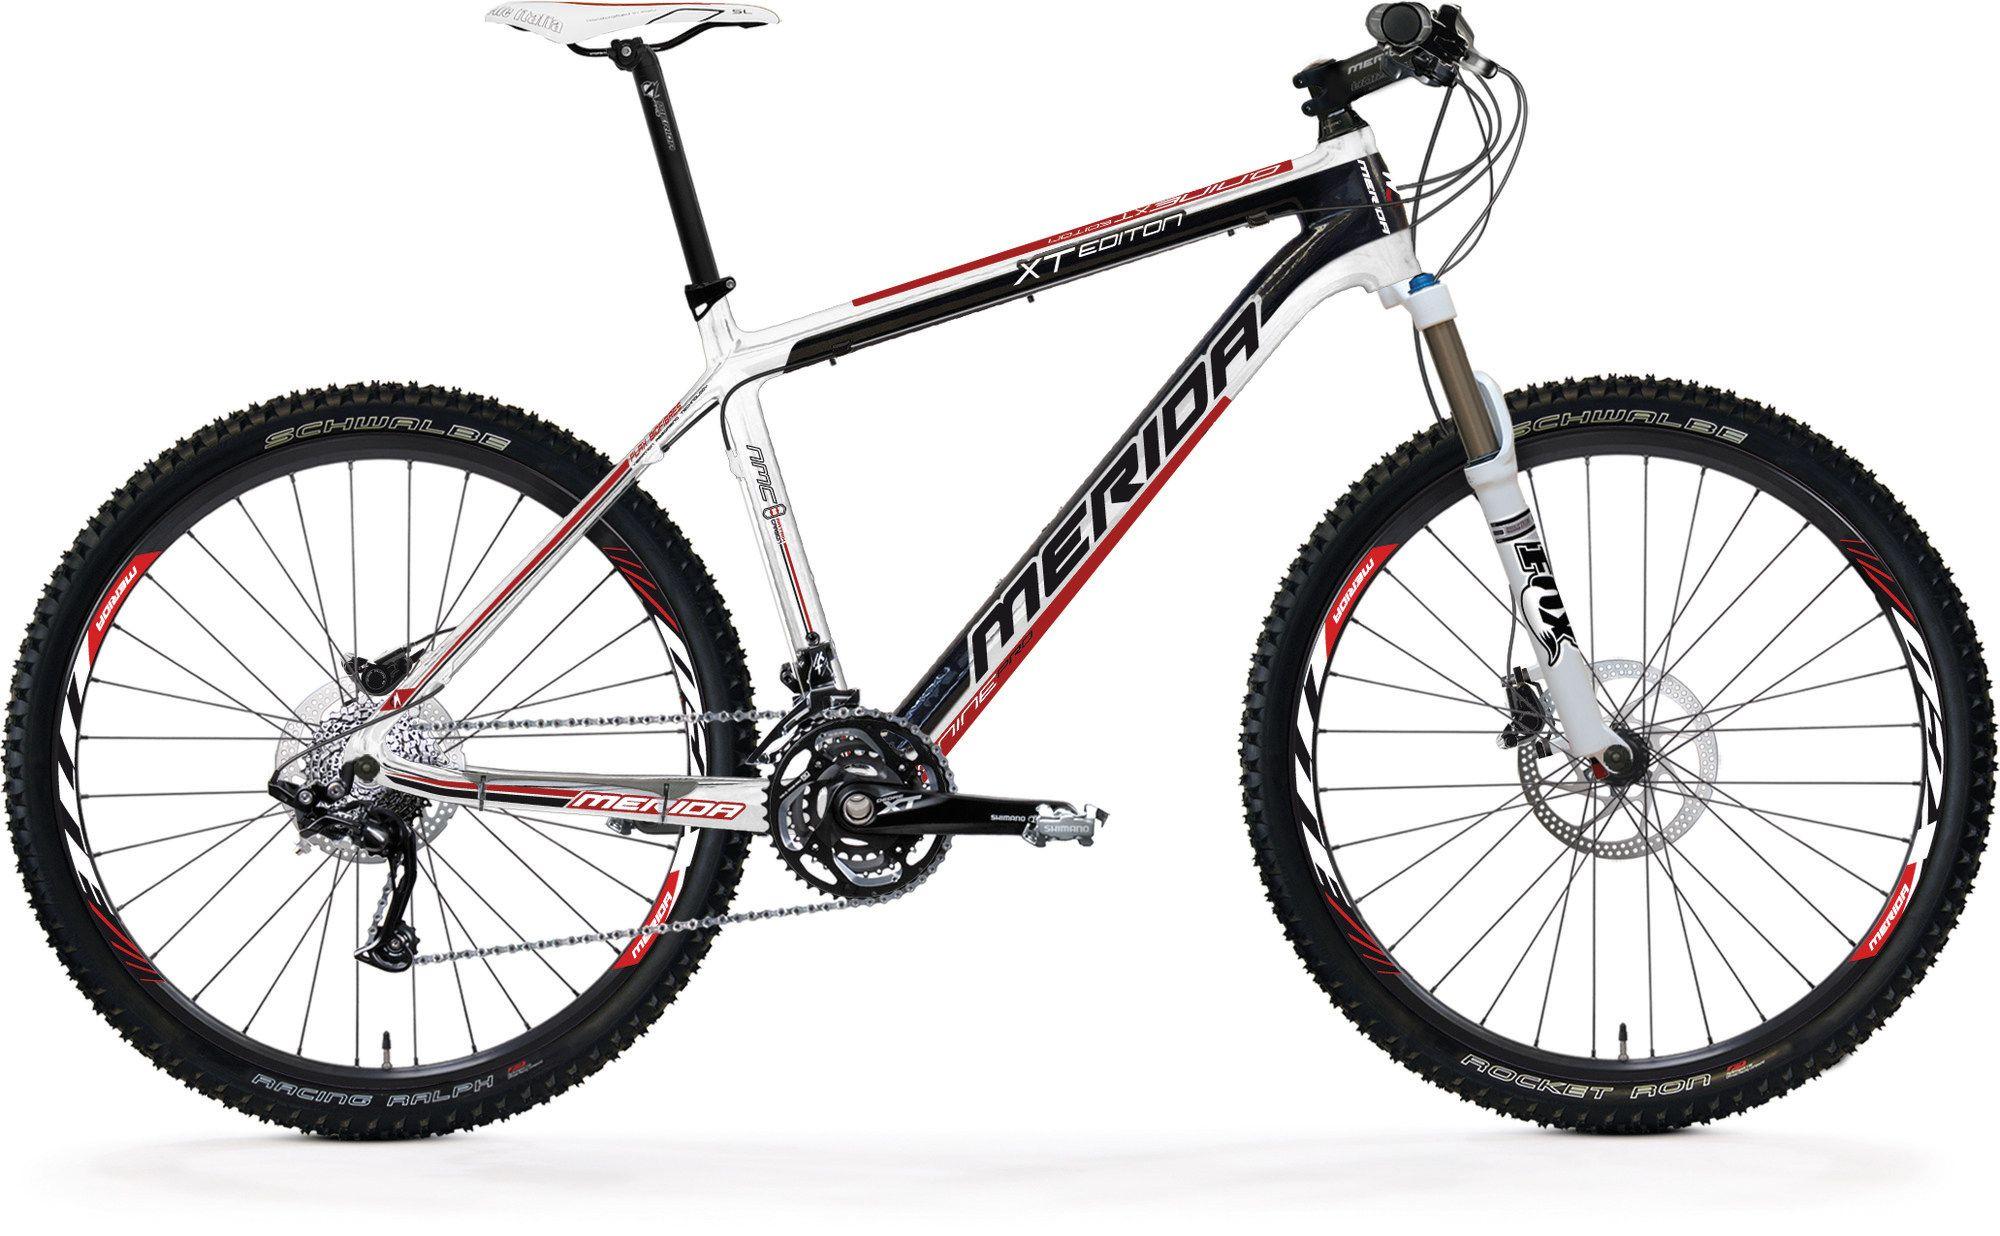 Merida Bikes | Outdoors | Merida bikes, Bike, Bicycle